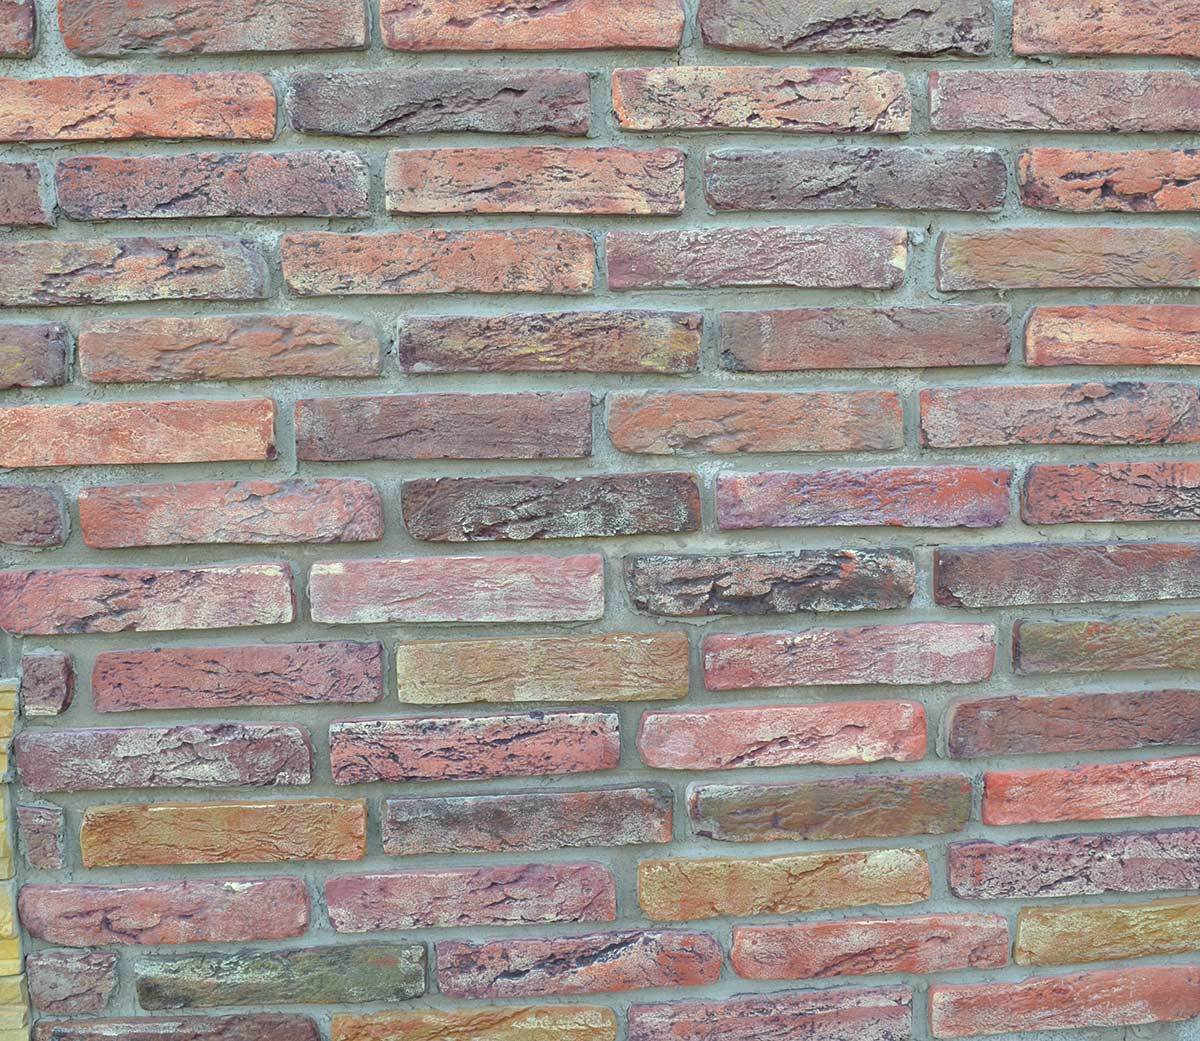 2pieceslot 20 bricks antique brick maker mold garden house path road concrete plastic wall - Concrete Tile Garden Decor